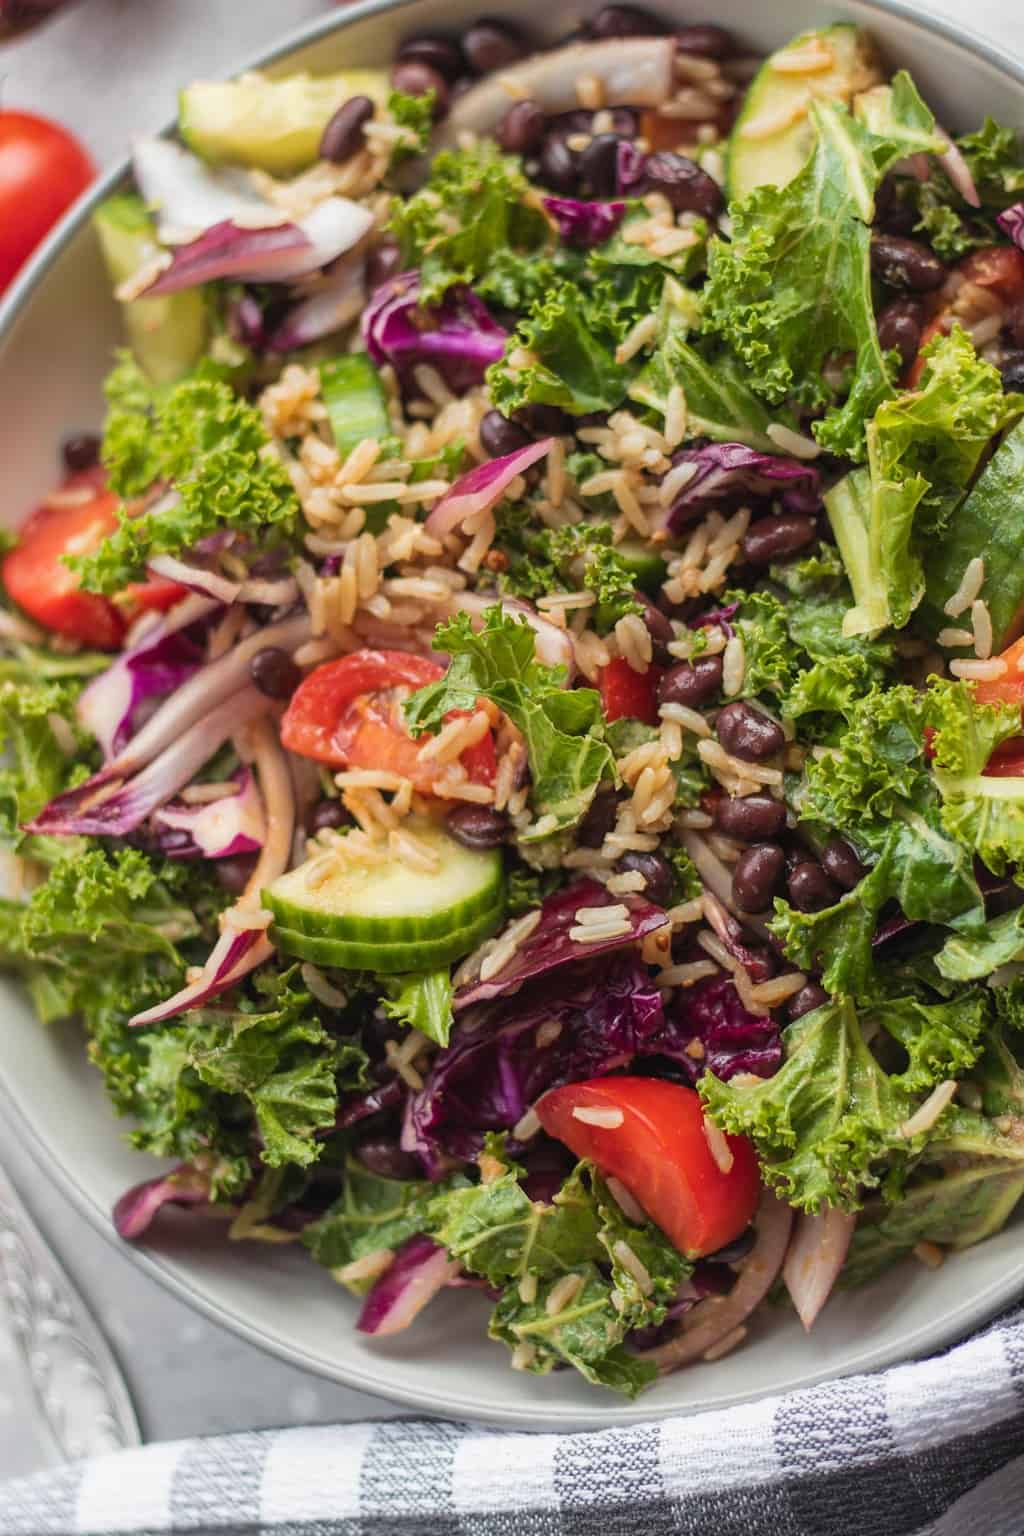 kale salad with fresh veggies and rice